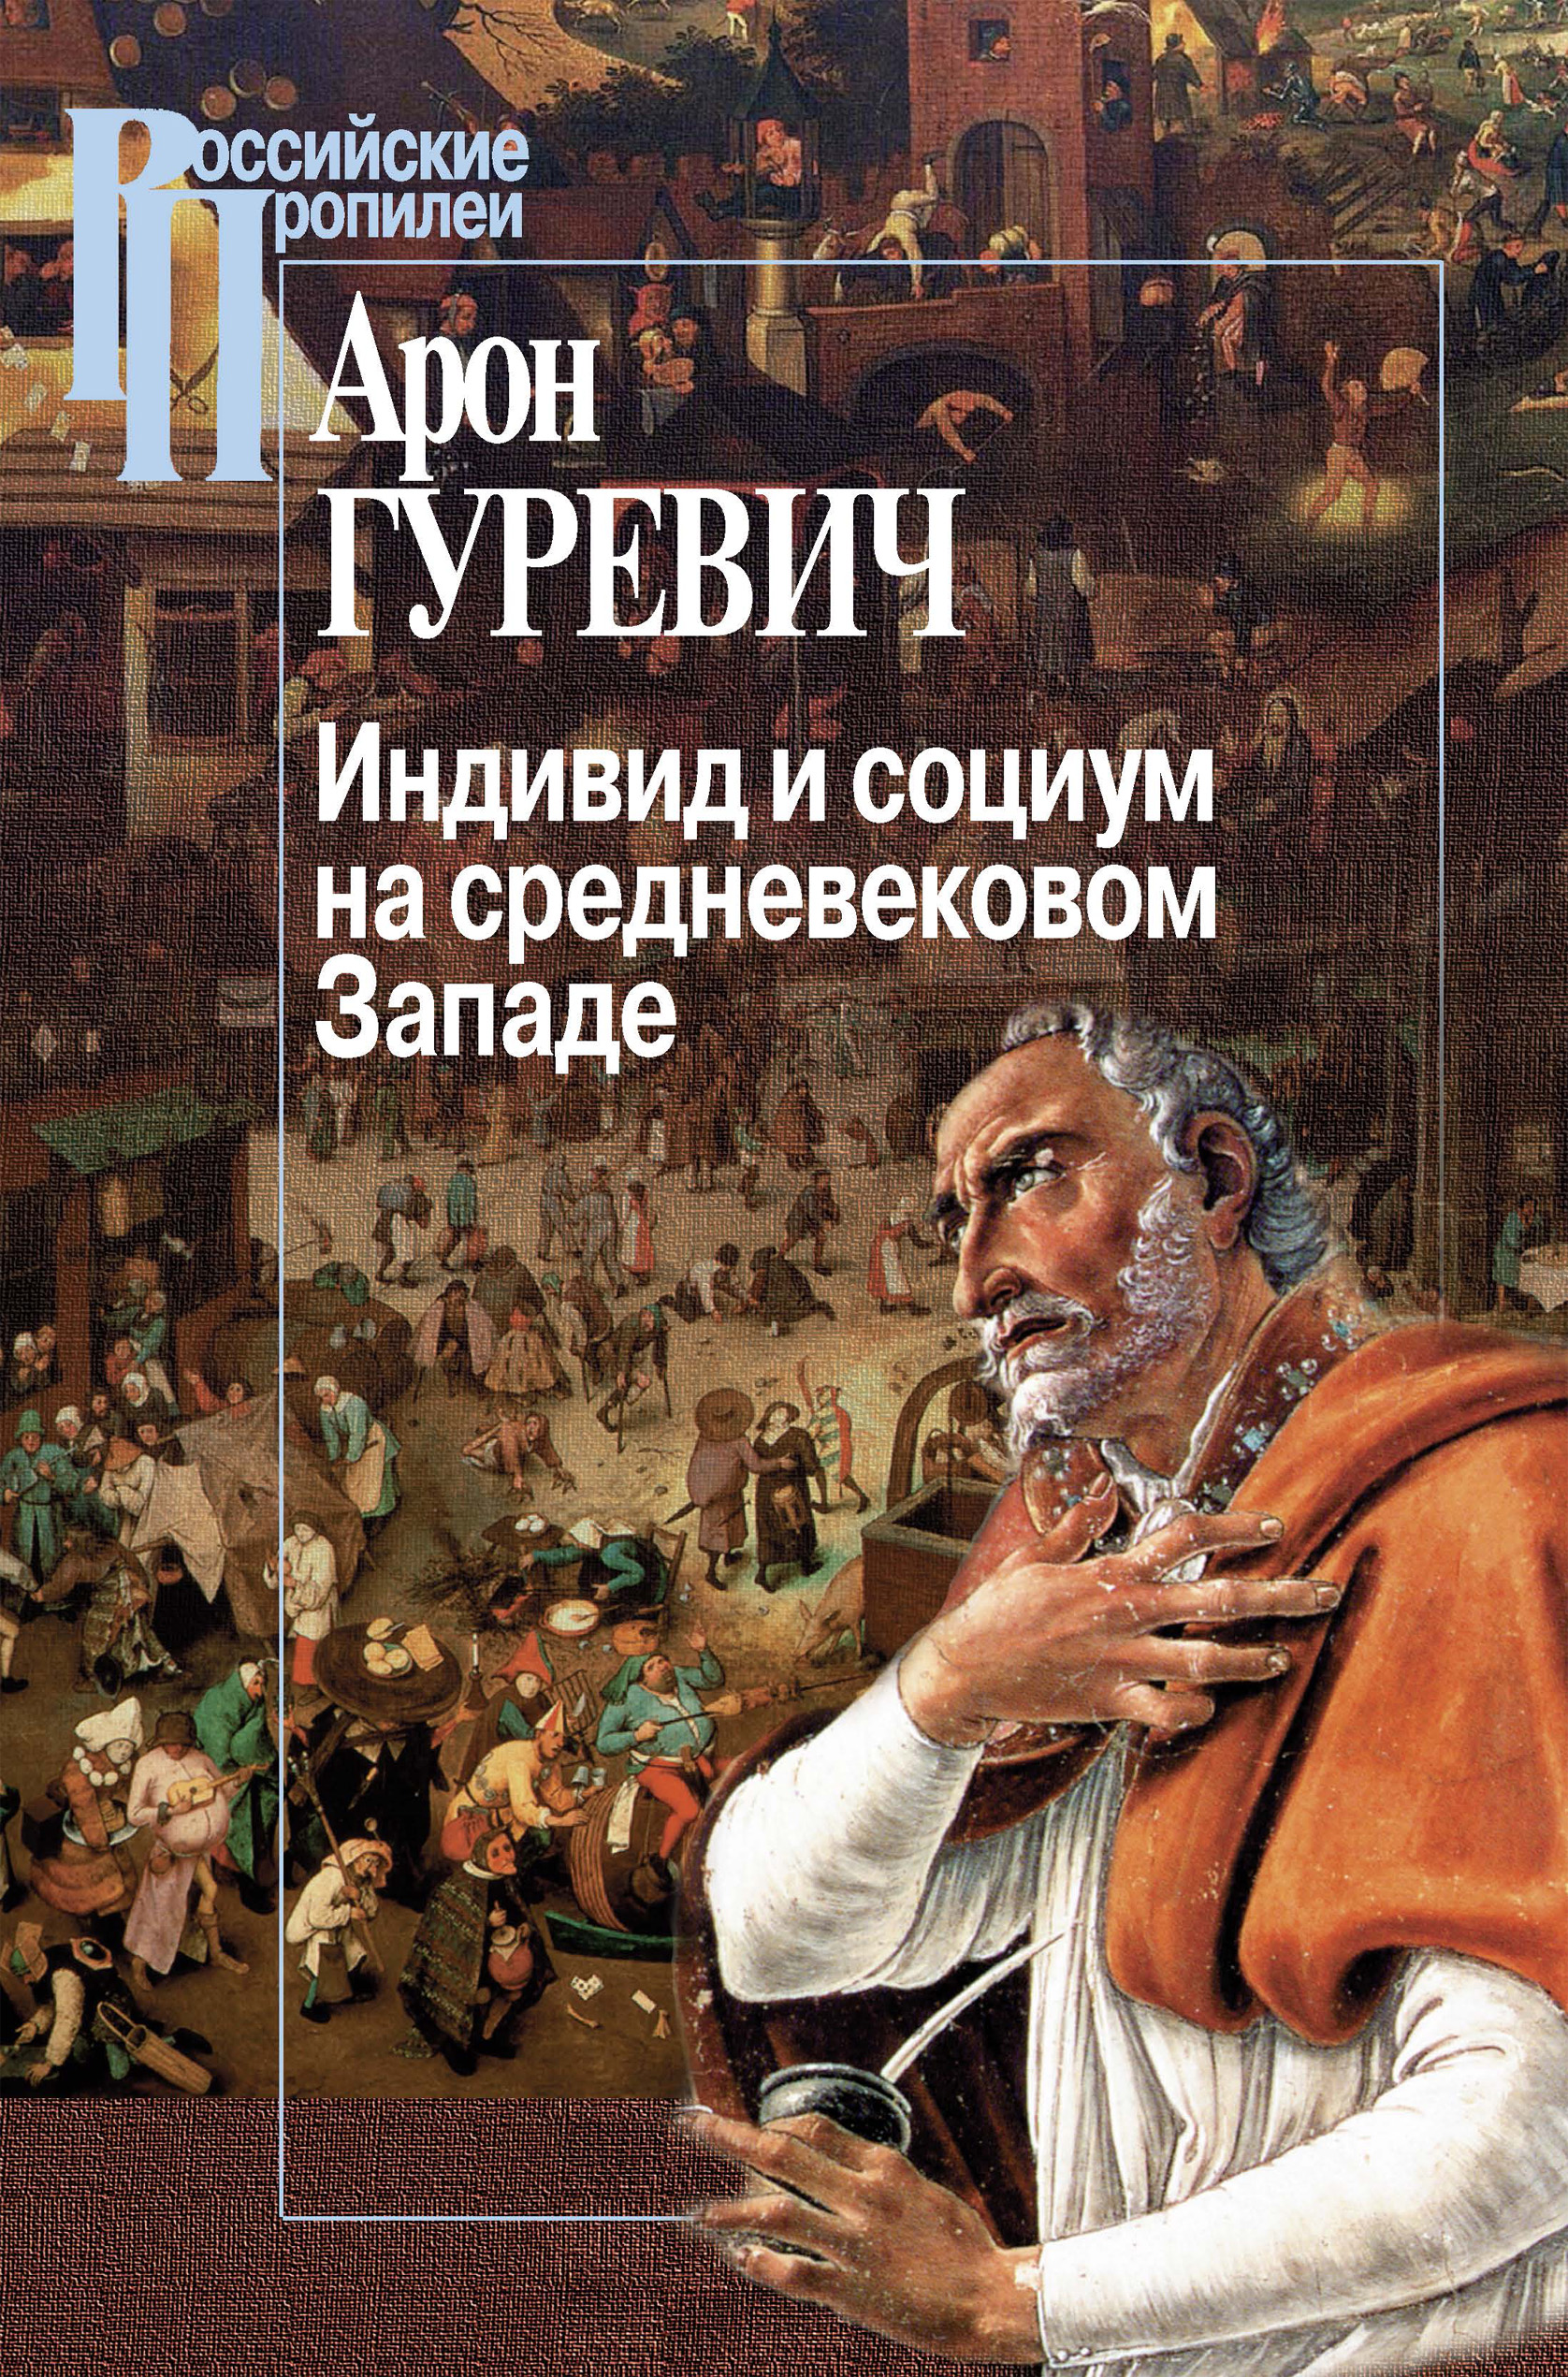 Арон Яковлевич Гуревич Индивид и социум на средневековом Западе цена